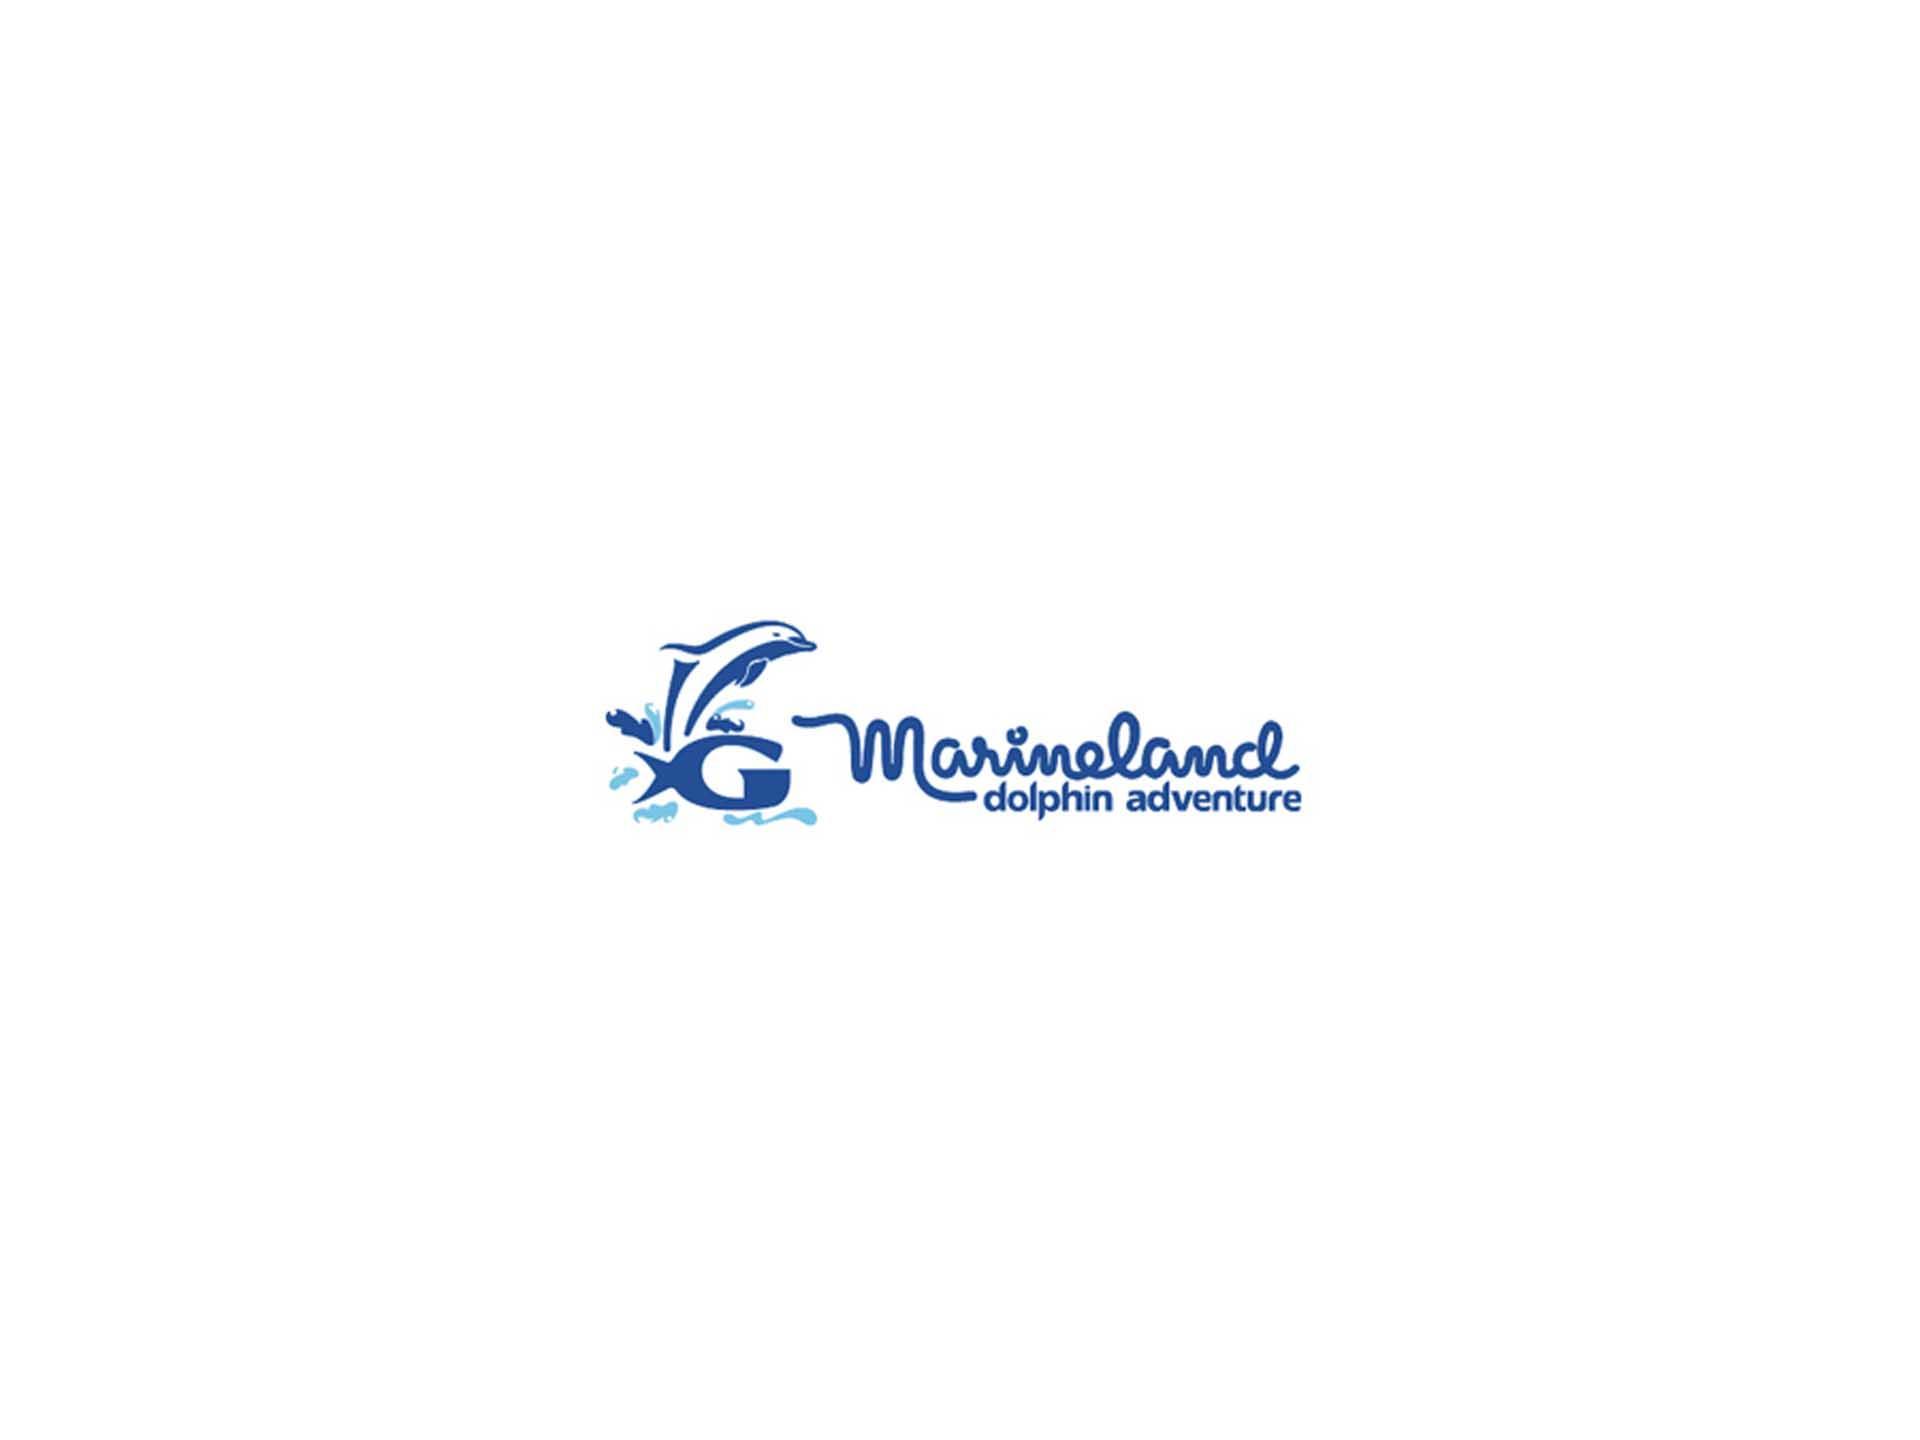 marineland dolphin adventure logo